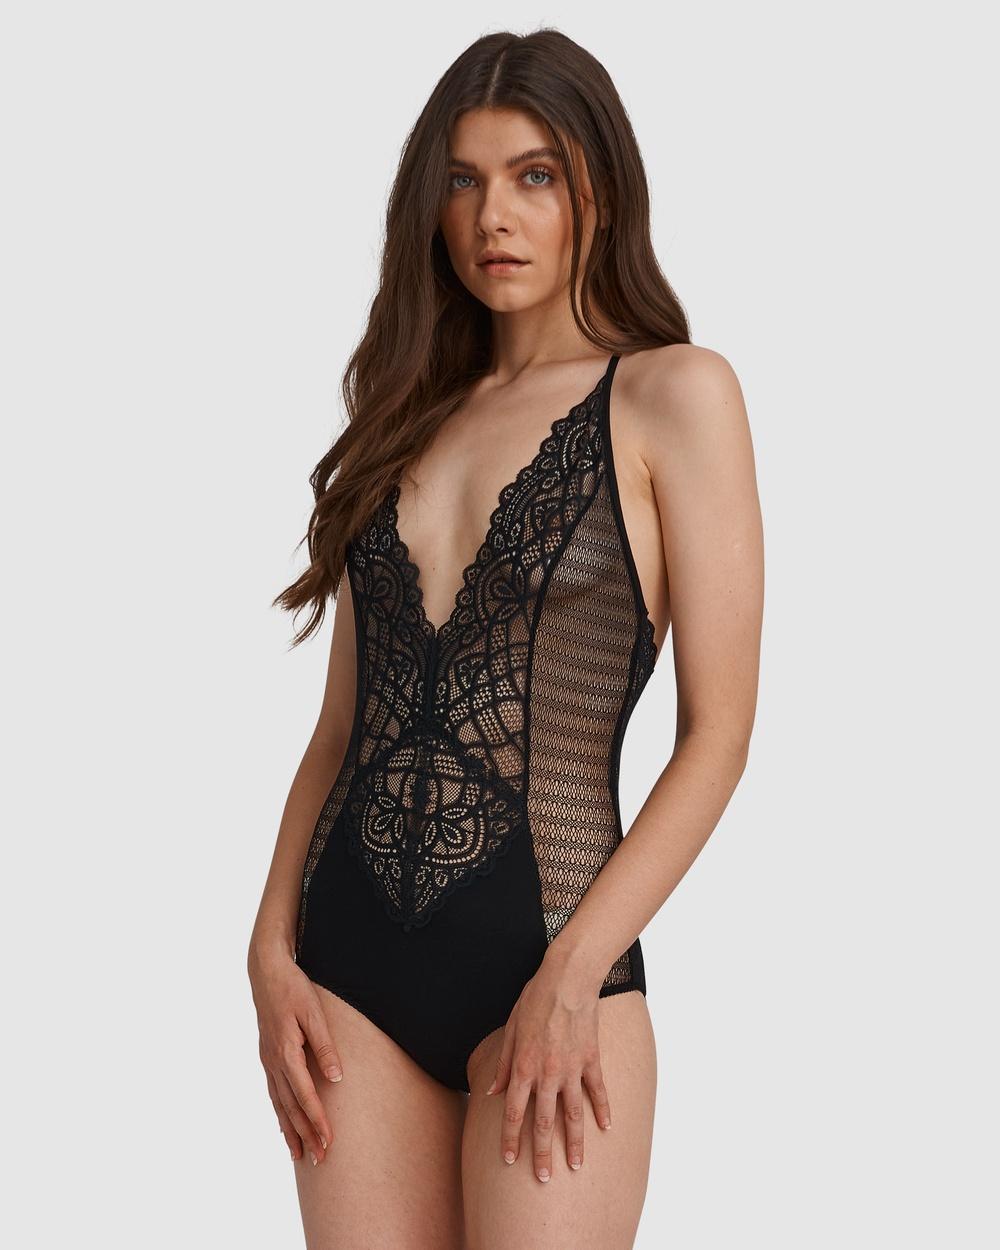 Oh!Zuza Lace Bodysuit Onesies Black Australia